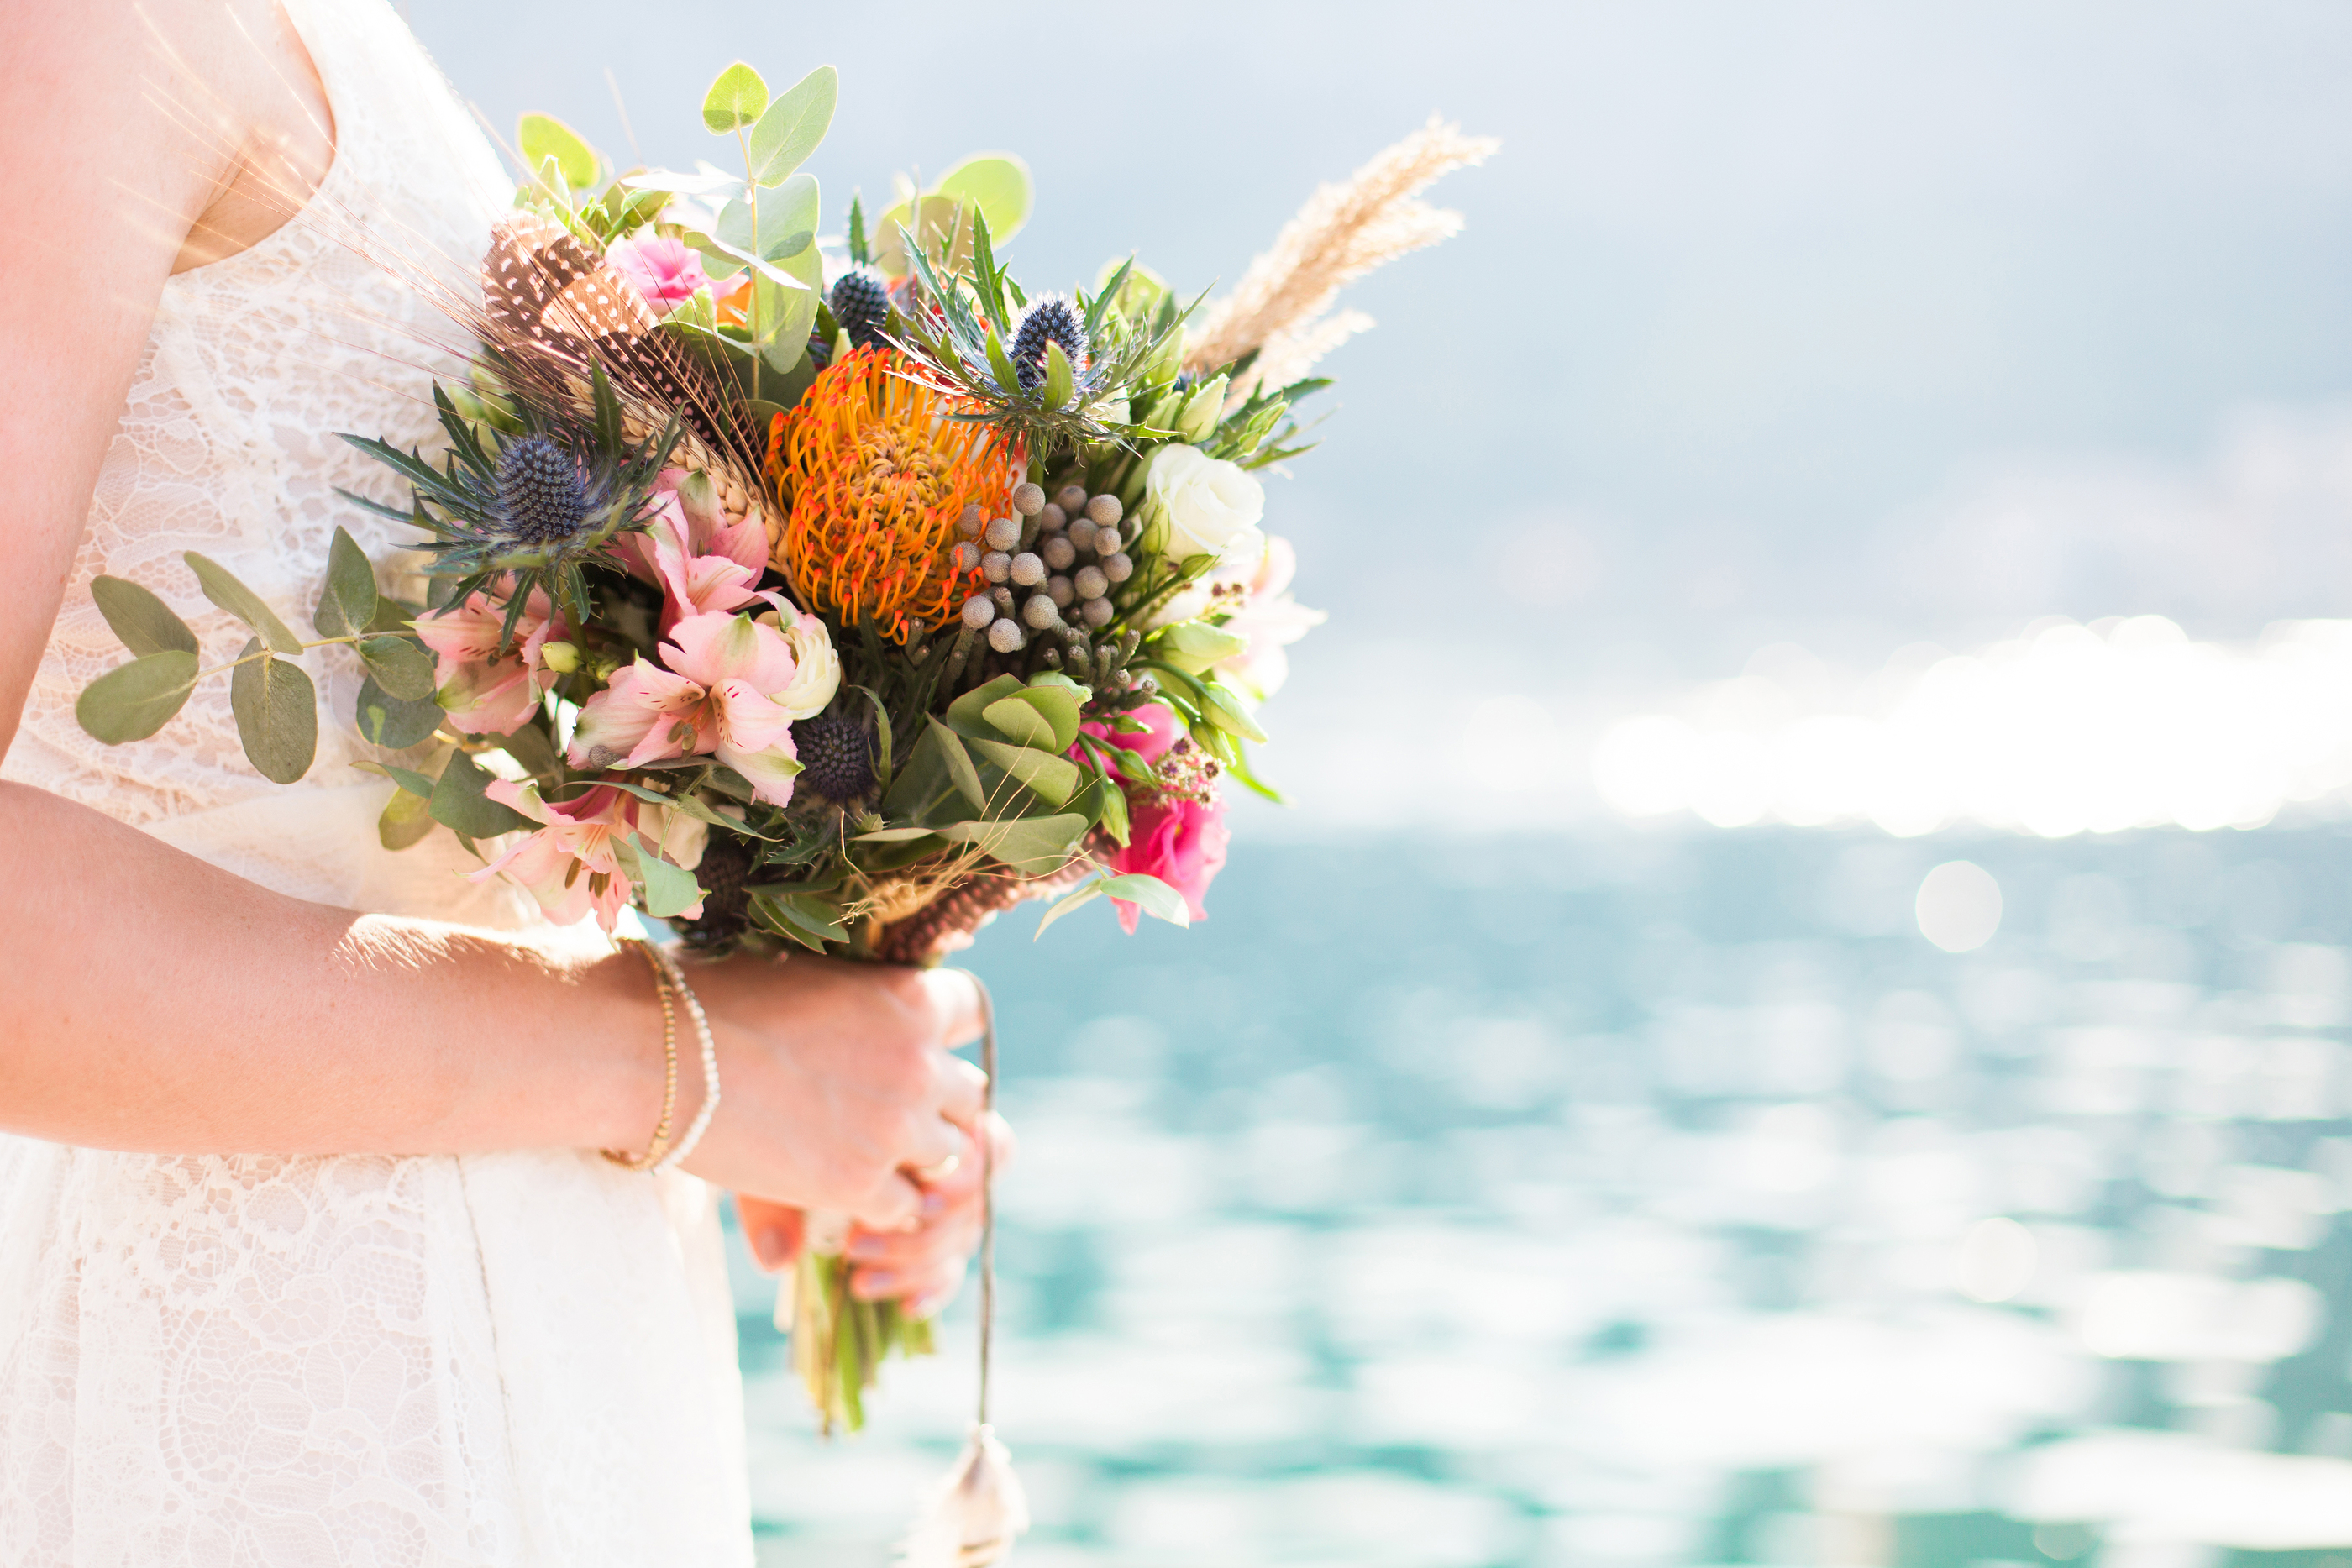 bigstock-Bride-With-Wedding-Flowers-Is--